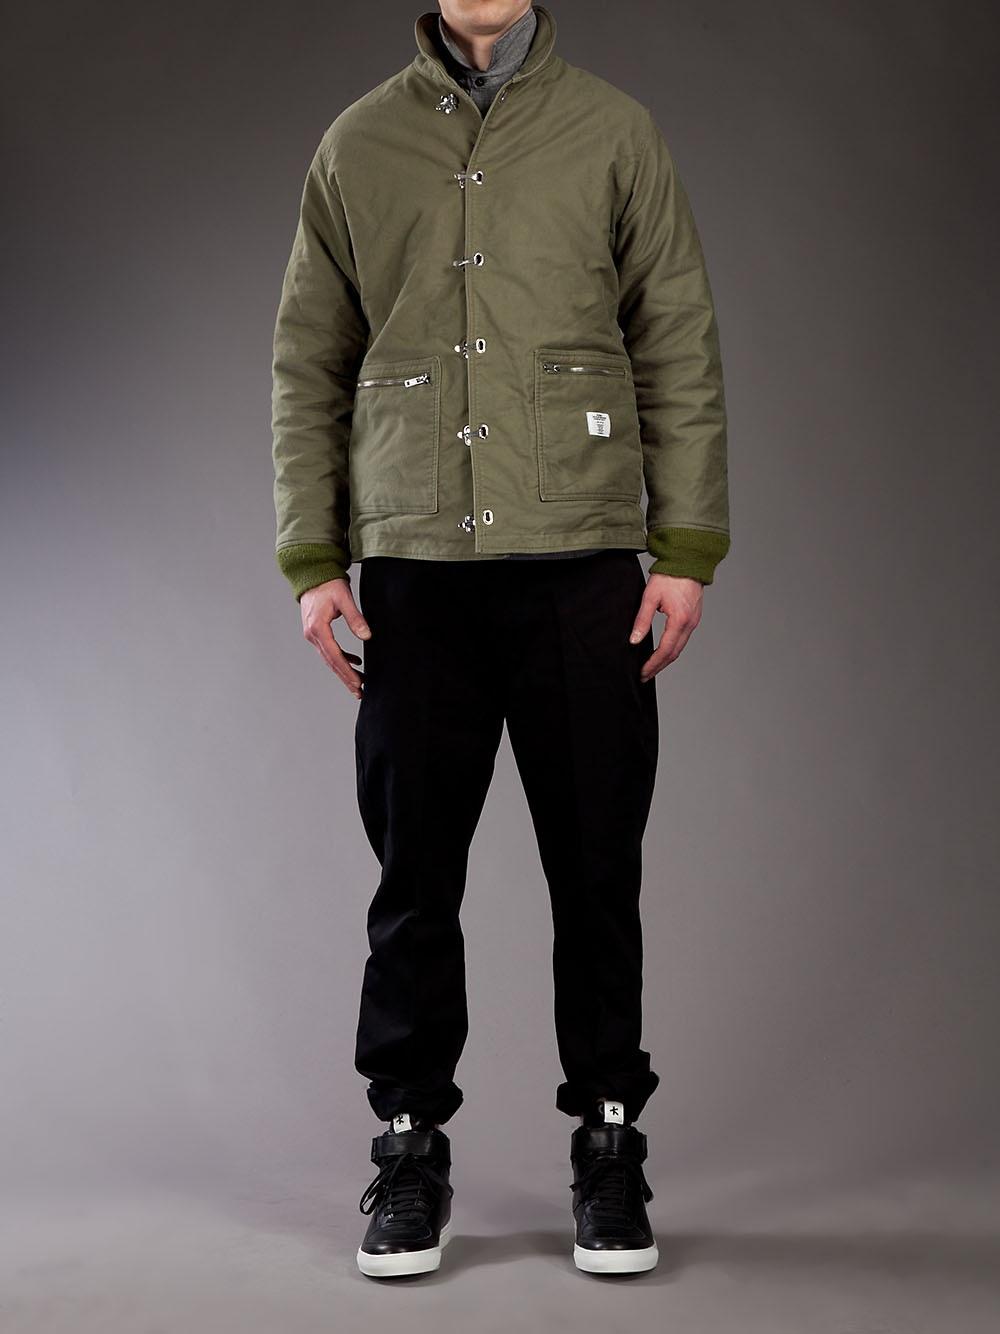 Bedwin And The Heartbreakers Hook Fastening Jacket in Green for Men